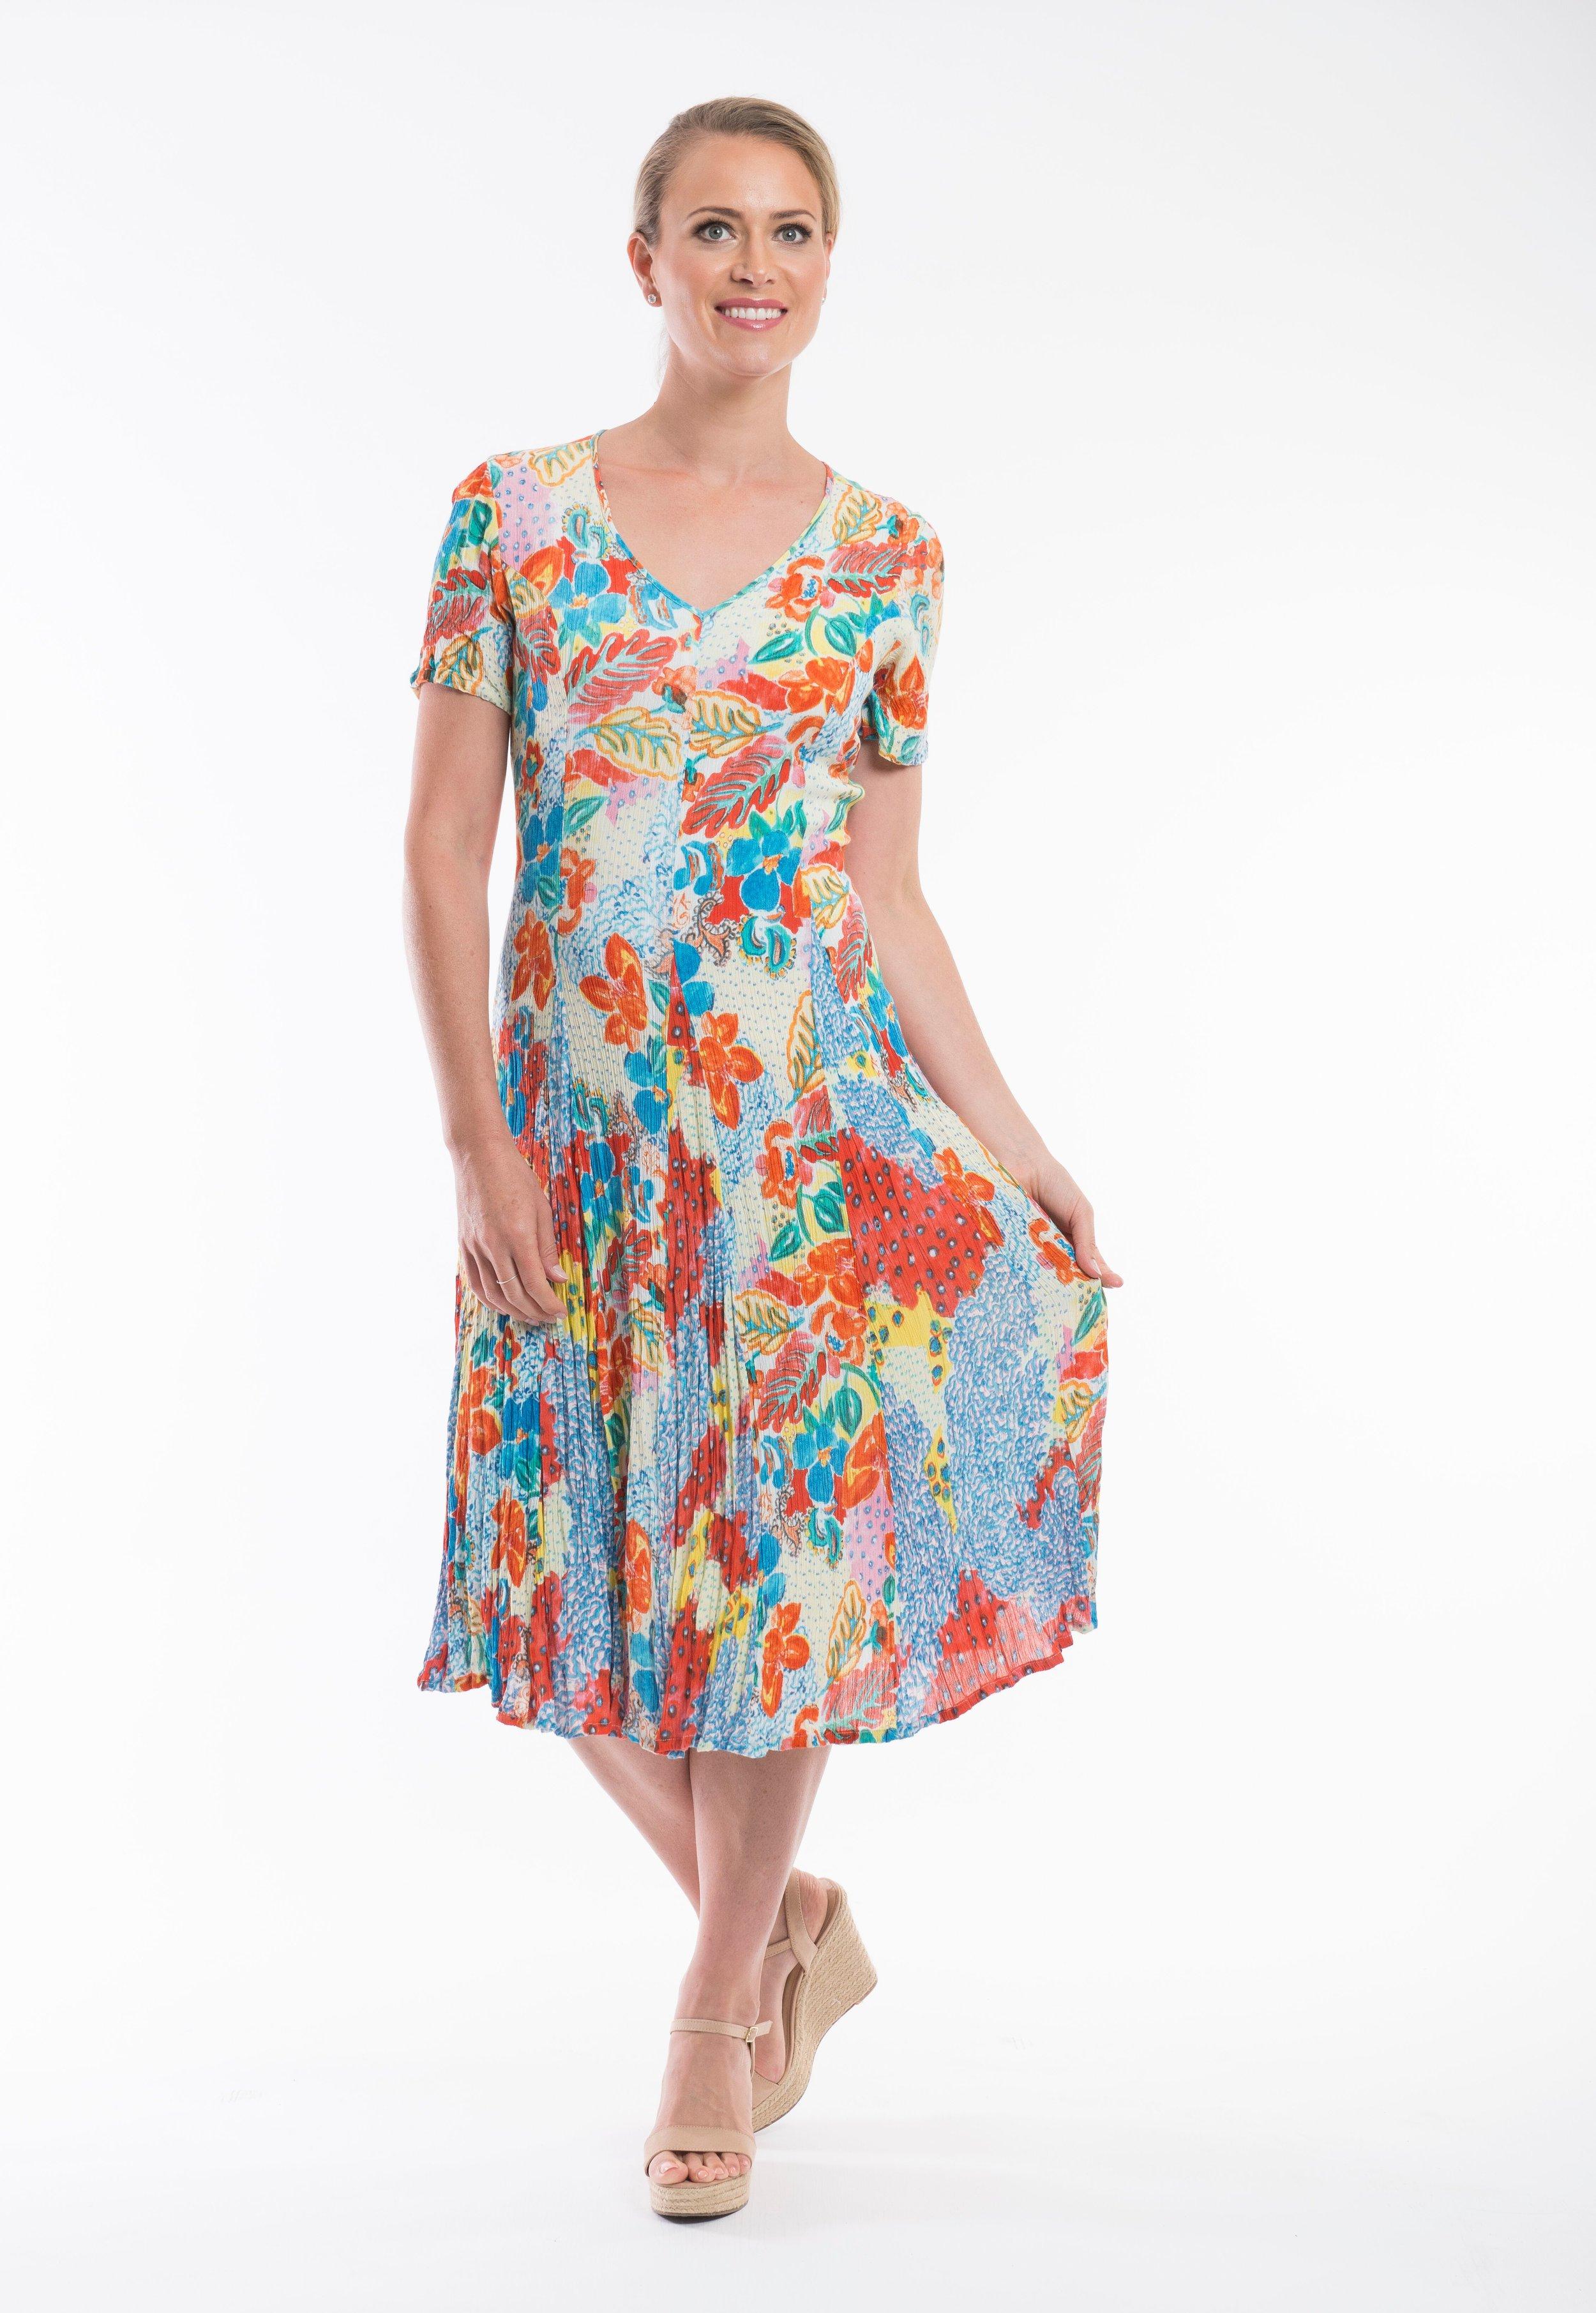 21206 Isola Bella Dress.jpeg